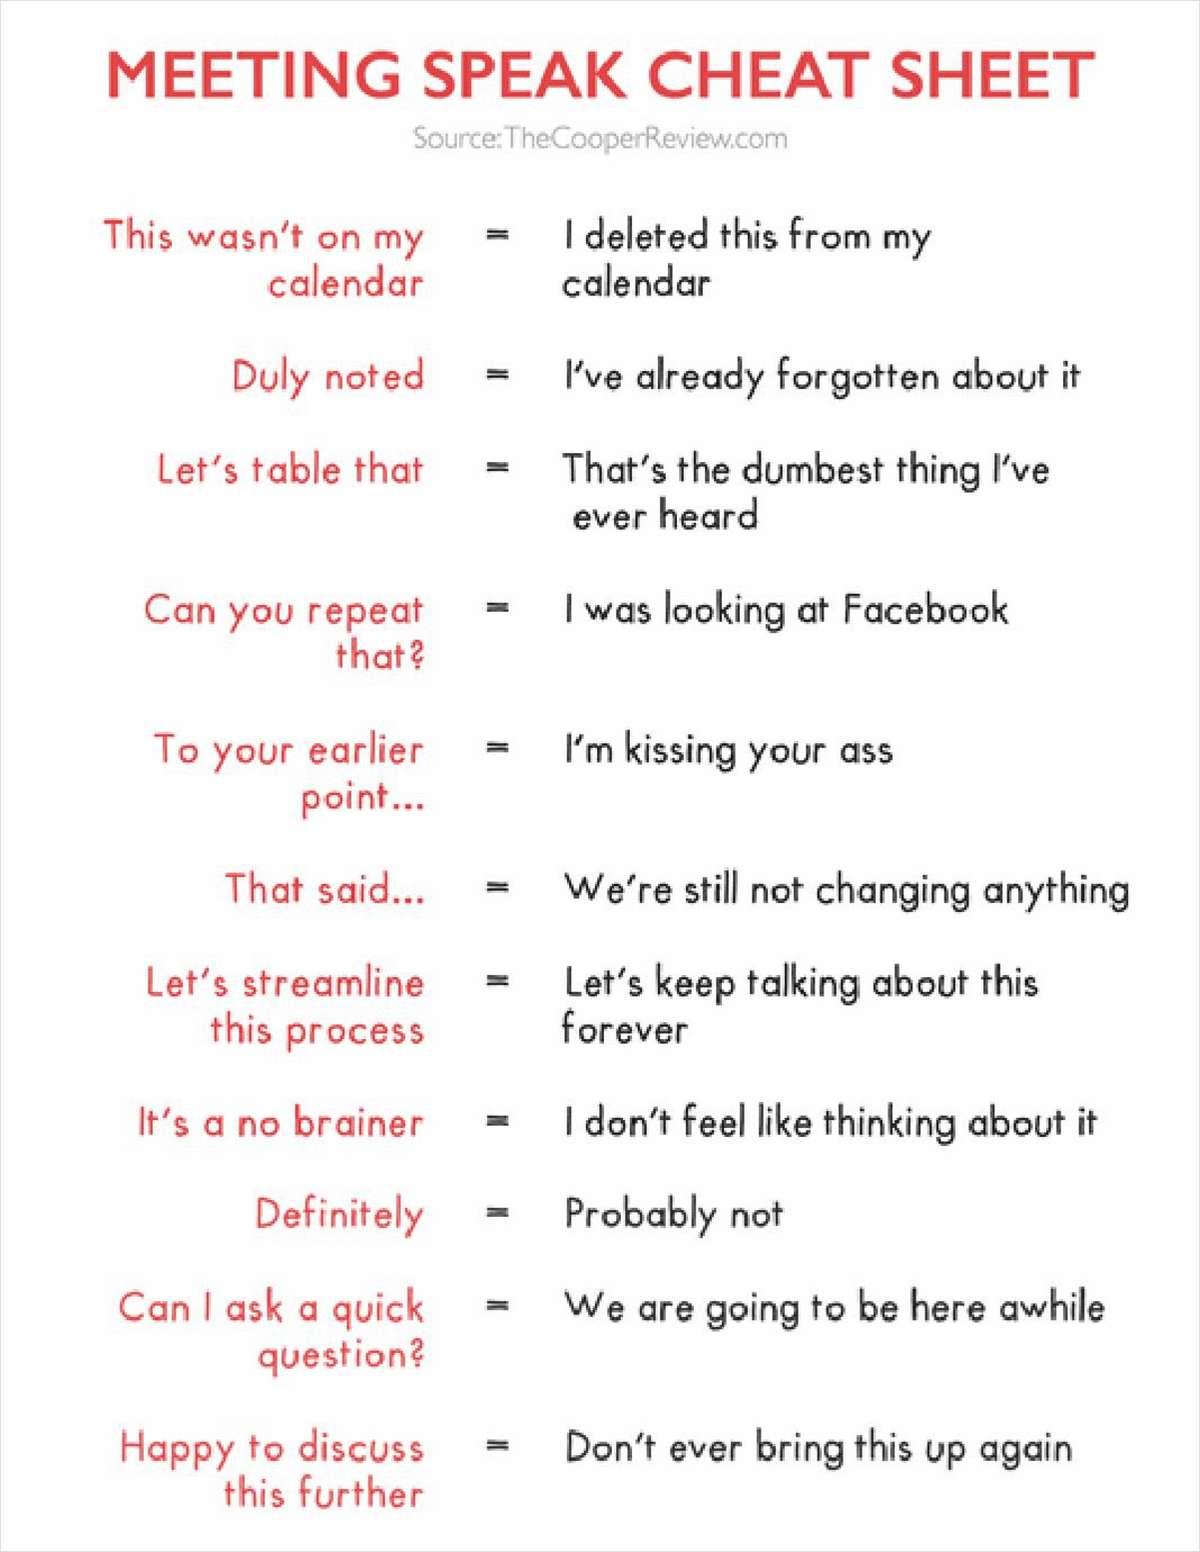 Meeting Speak Cheat Sheet